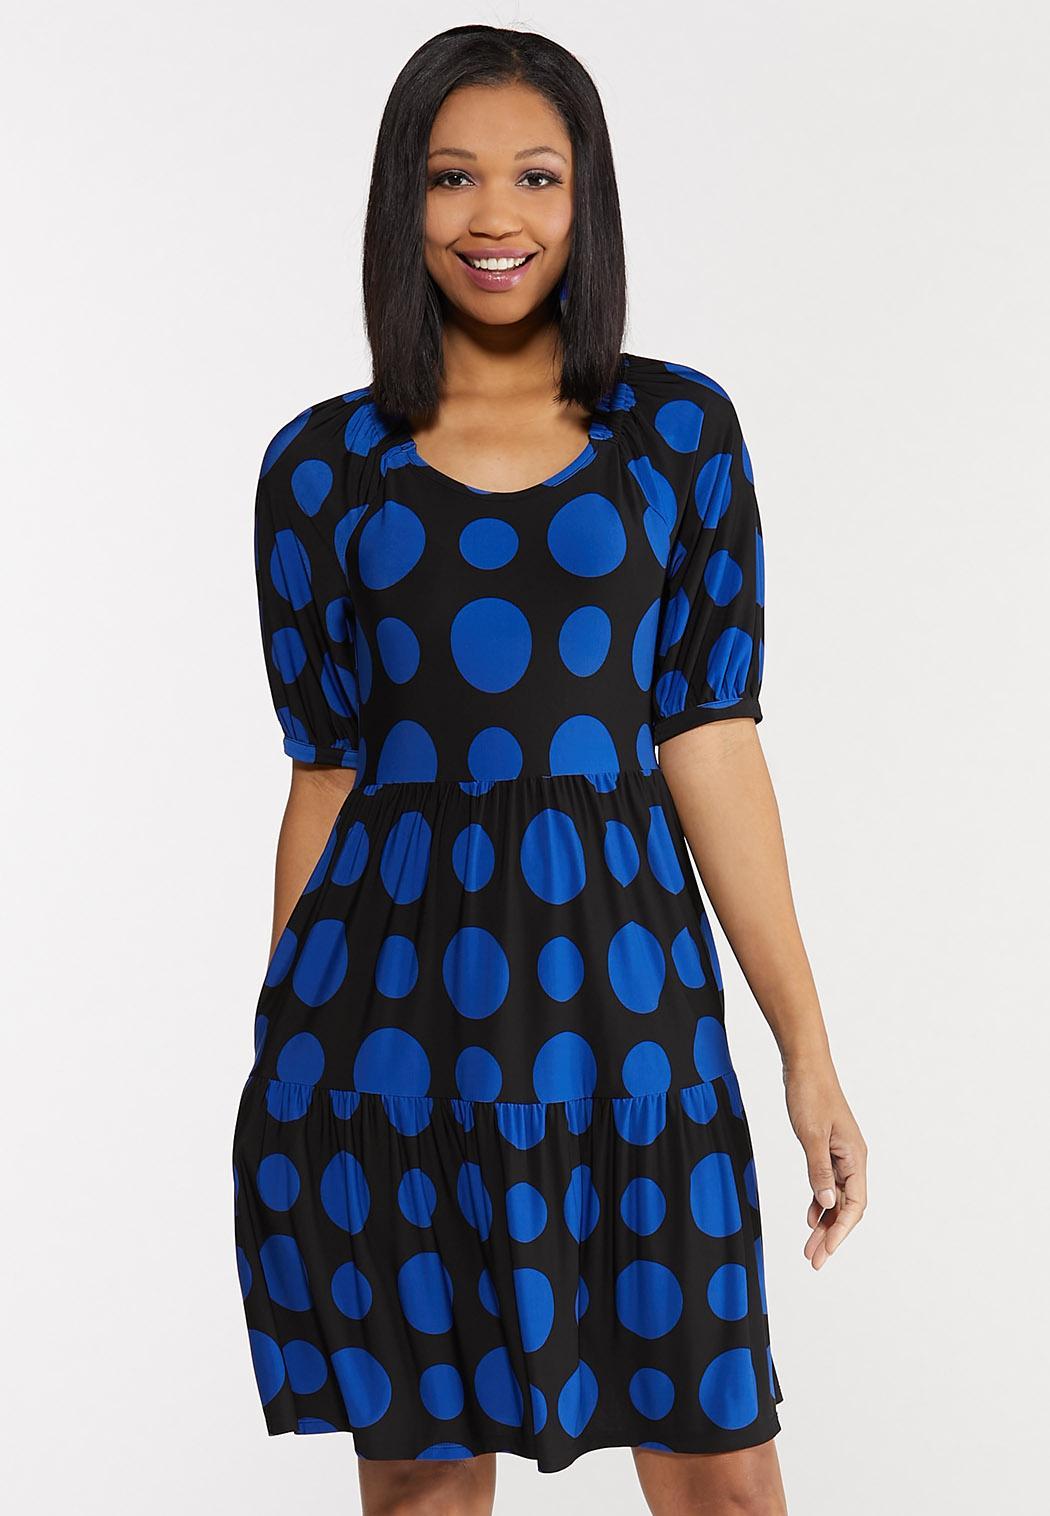 Polka Dot Puff Sleeve Dress